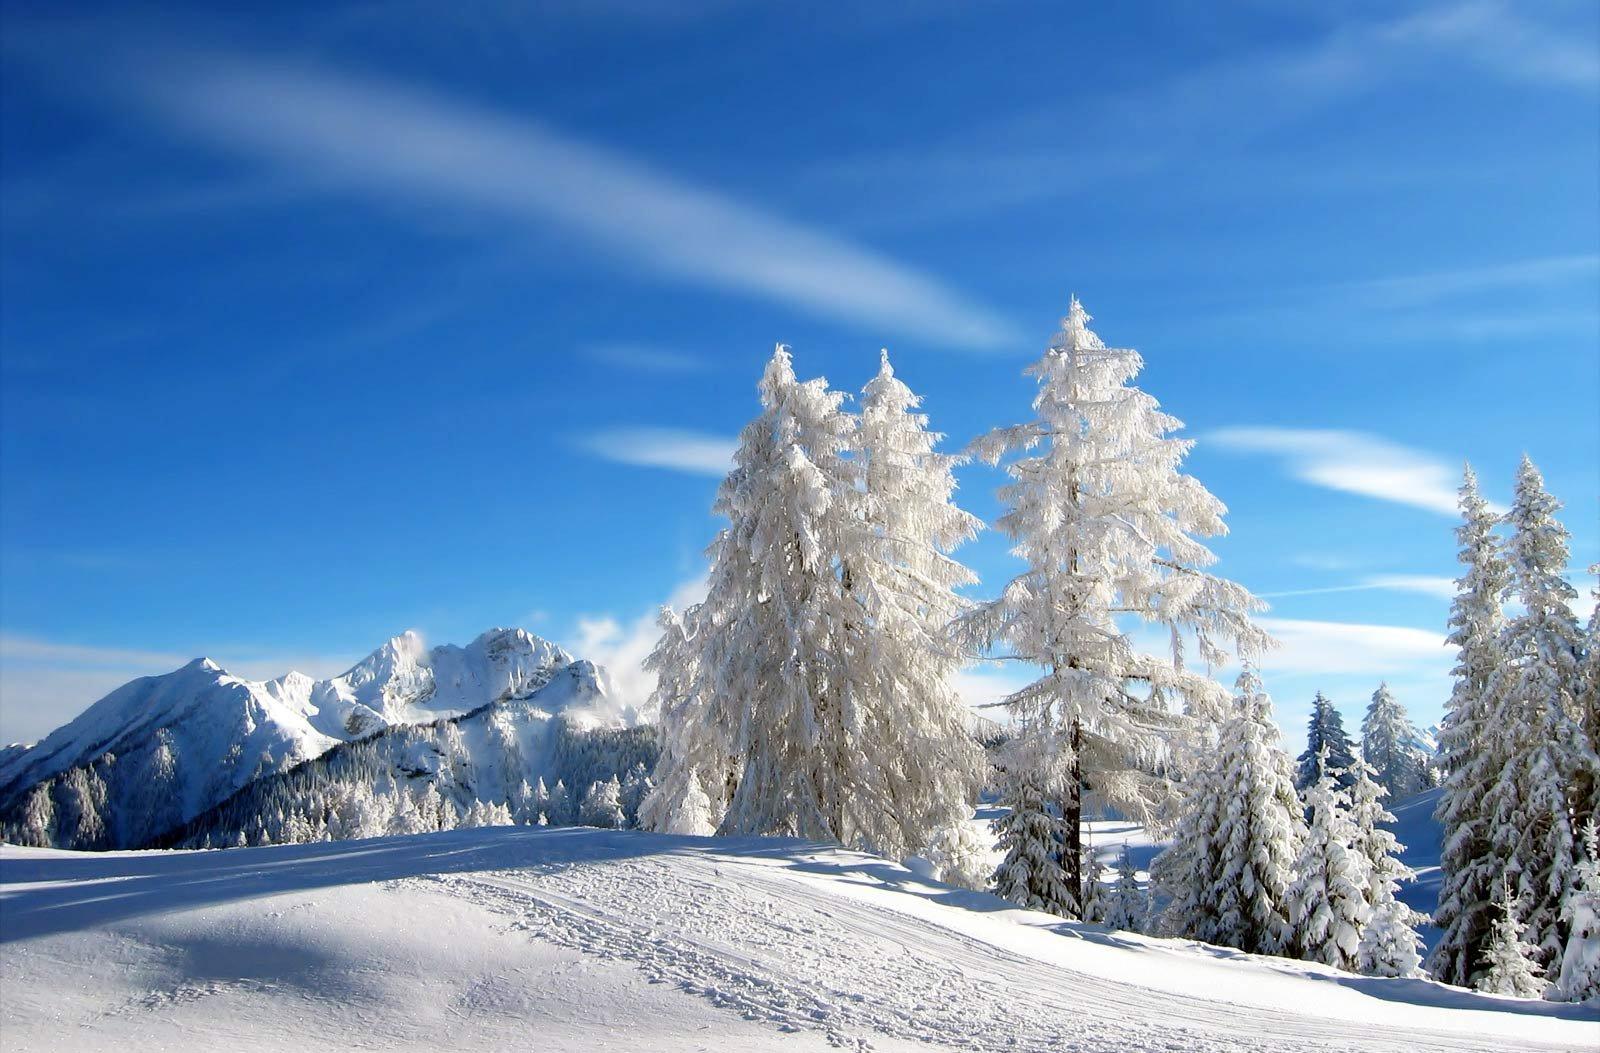 Зимние открытки про природу, носки открытки